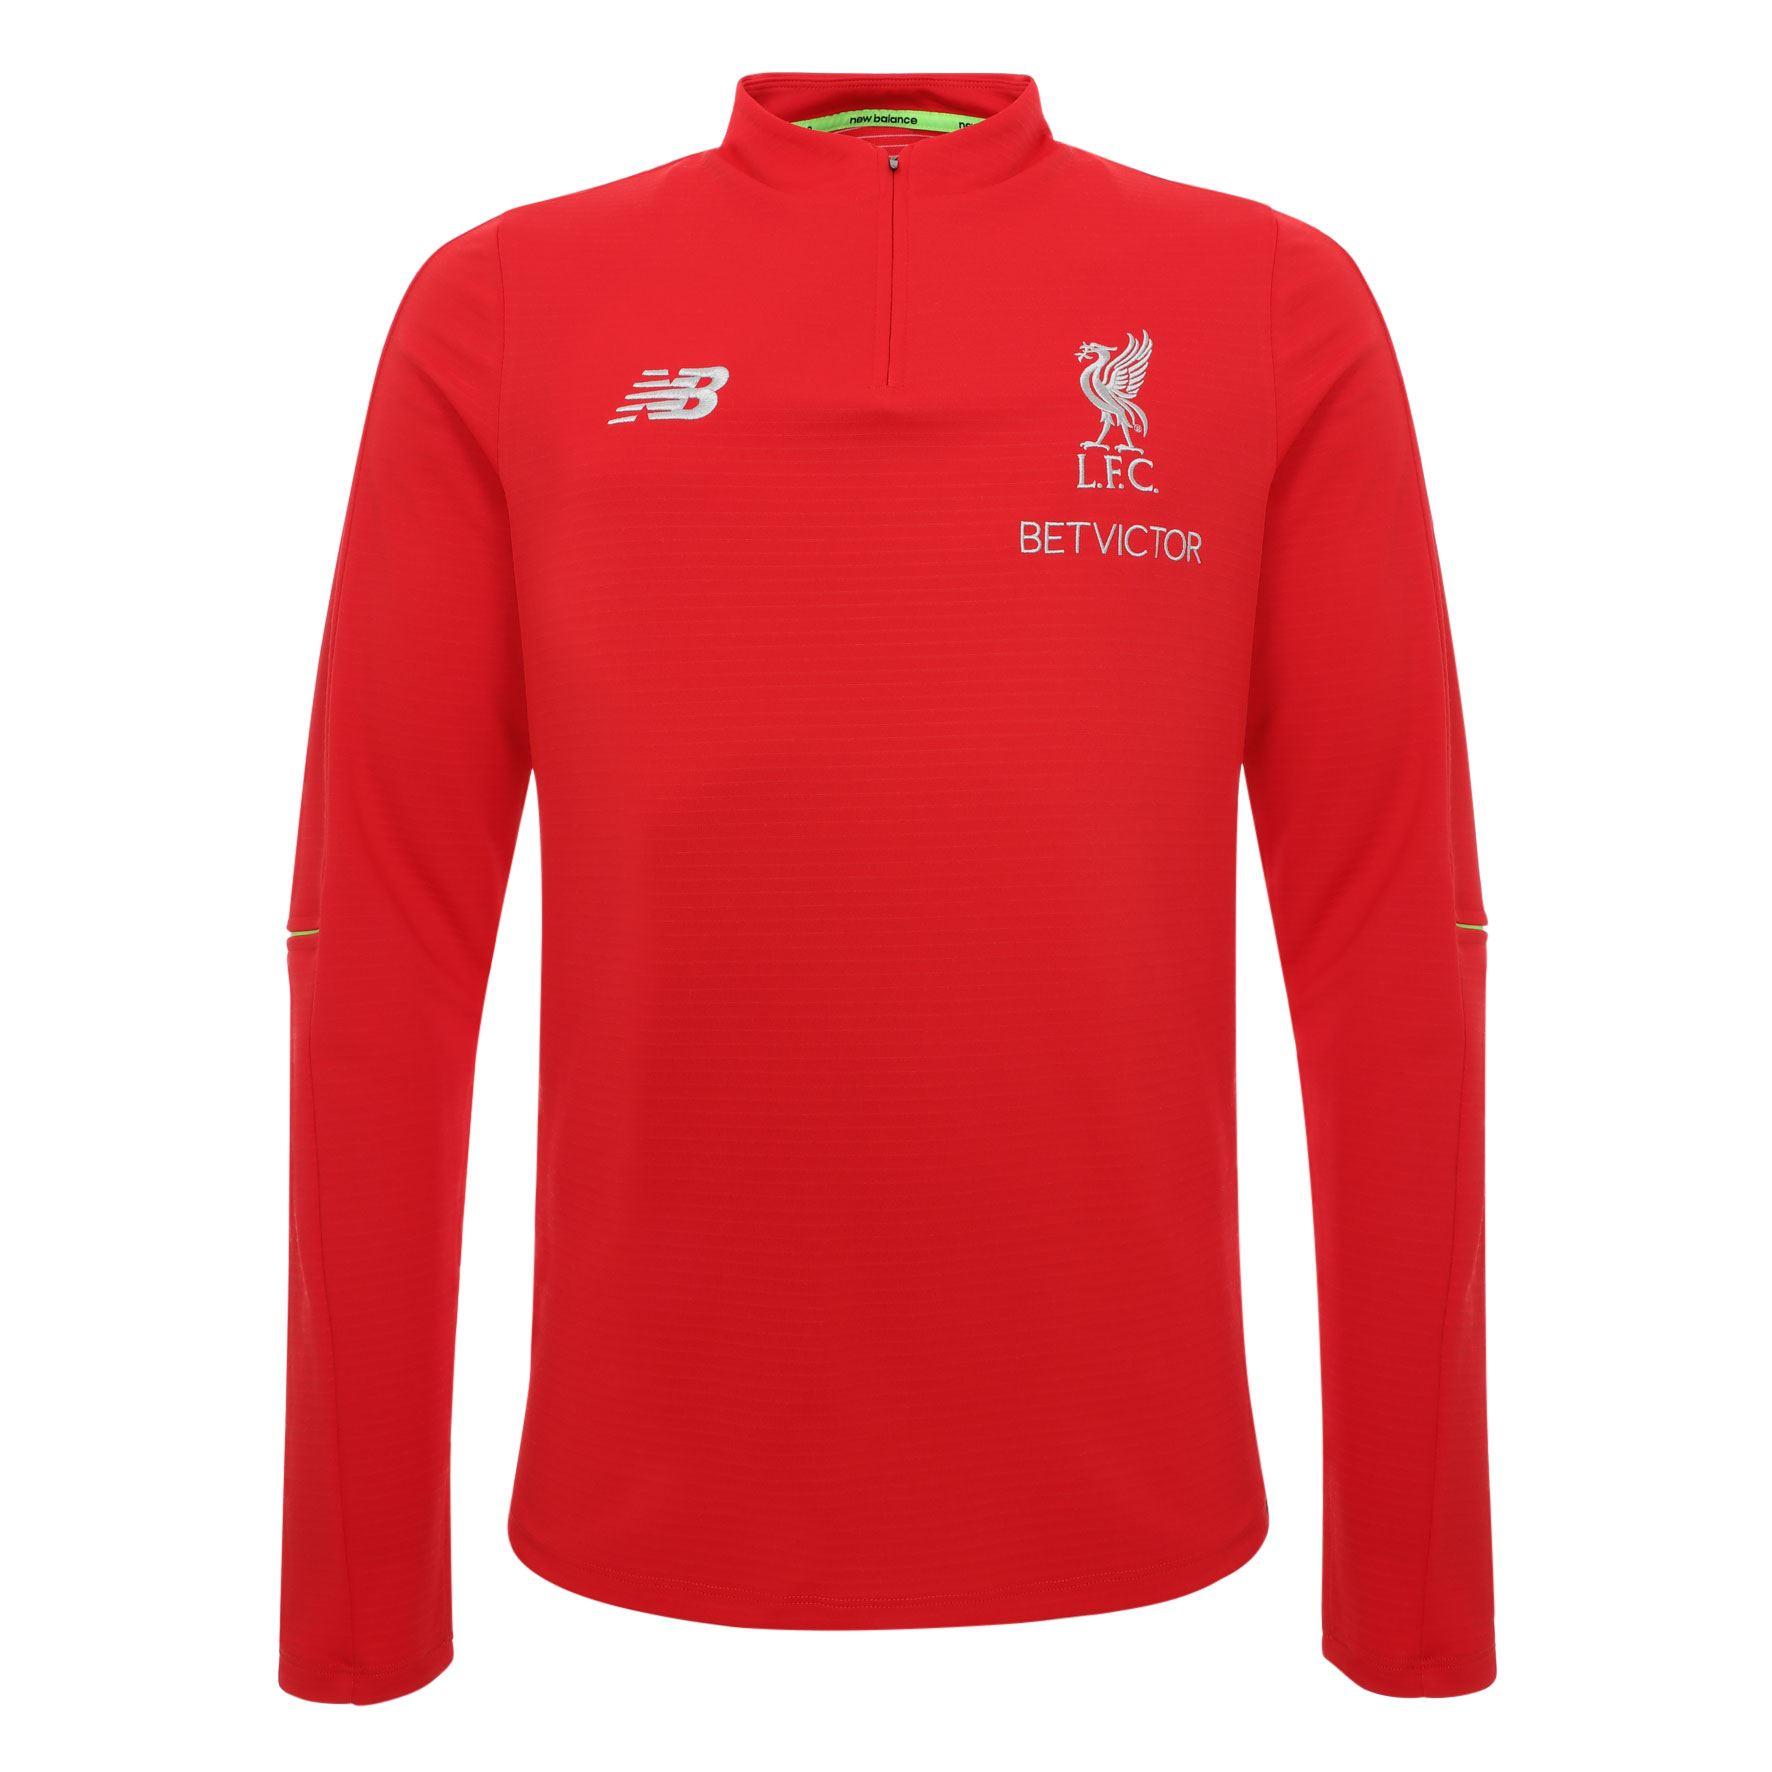 Liverpool FC Camiseta Entrenamiento Hombre Roja Manga Larga 18 19 LFC  Oficial e0375b8a7fb